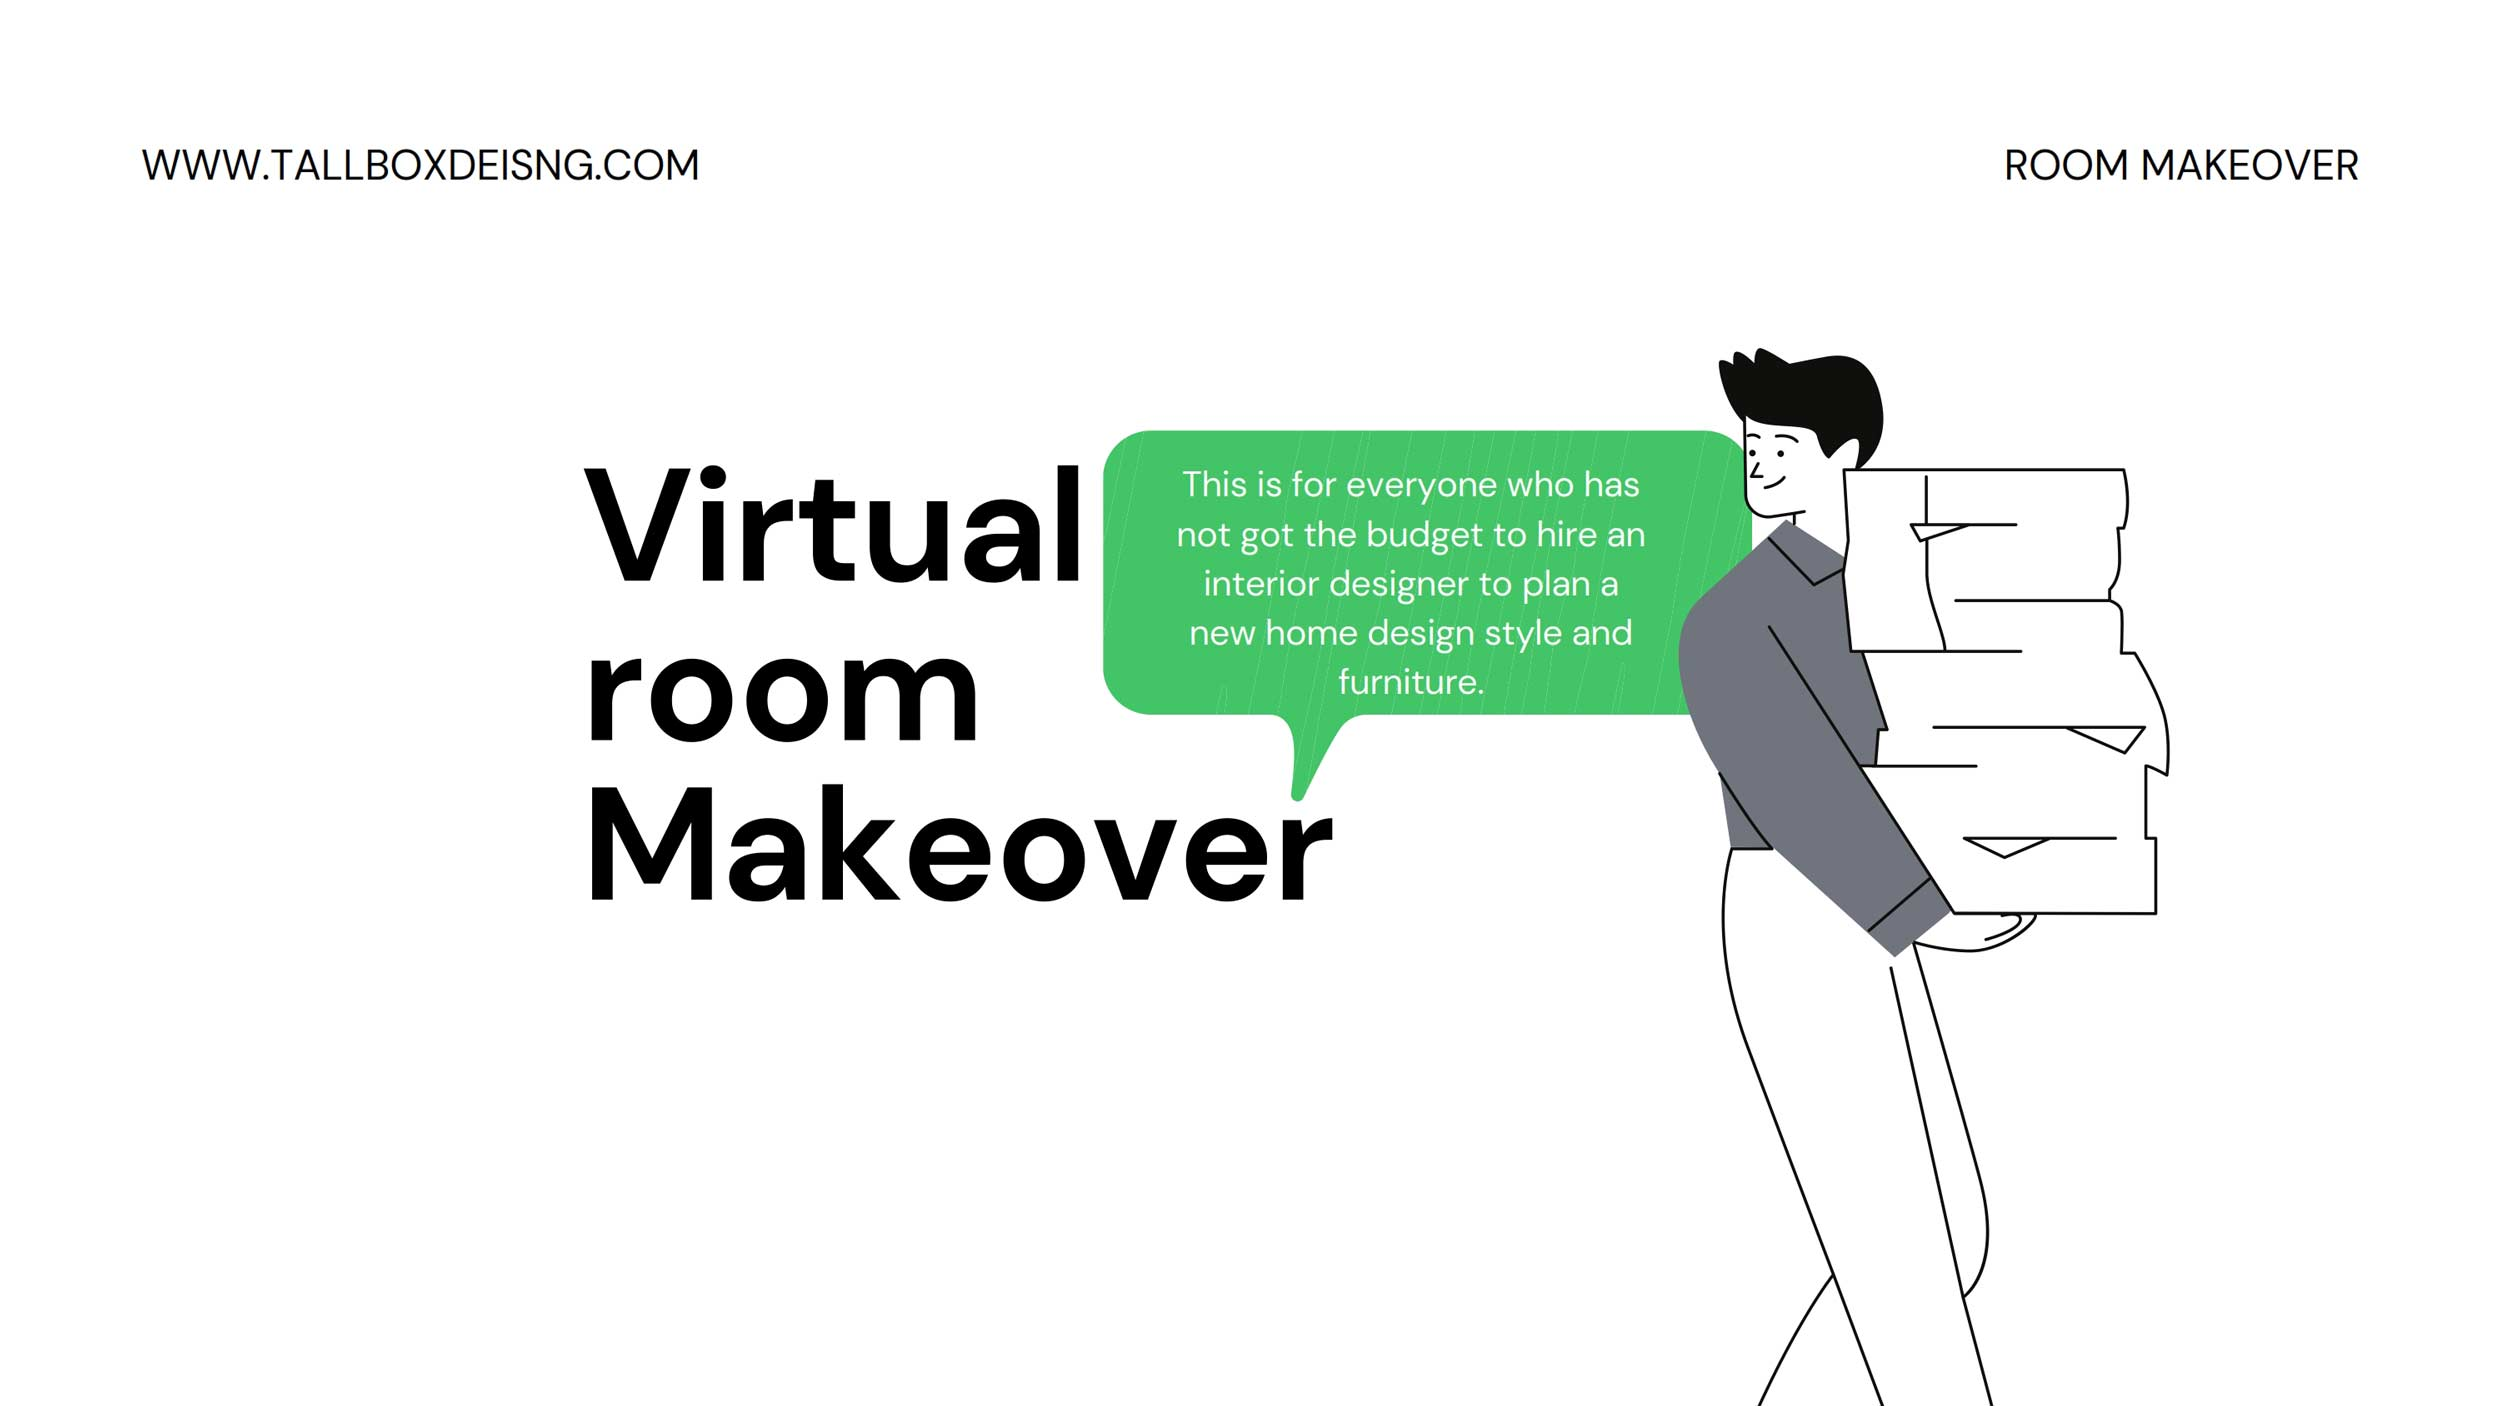 Virtual Room Makeover – Room Design application